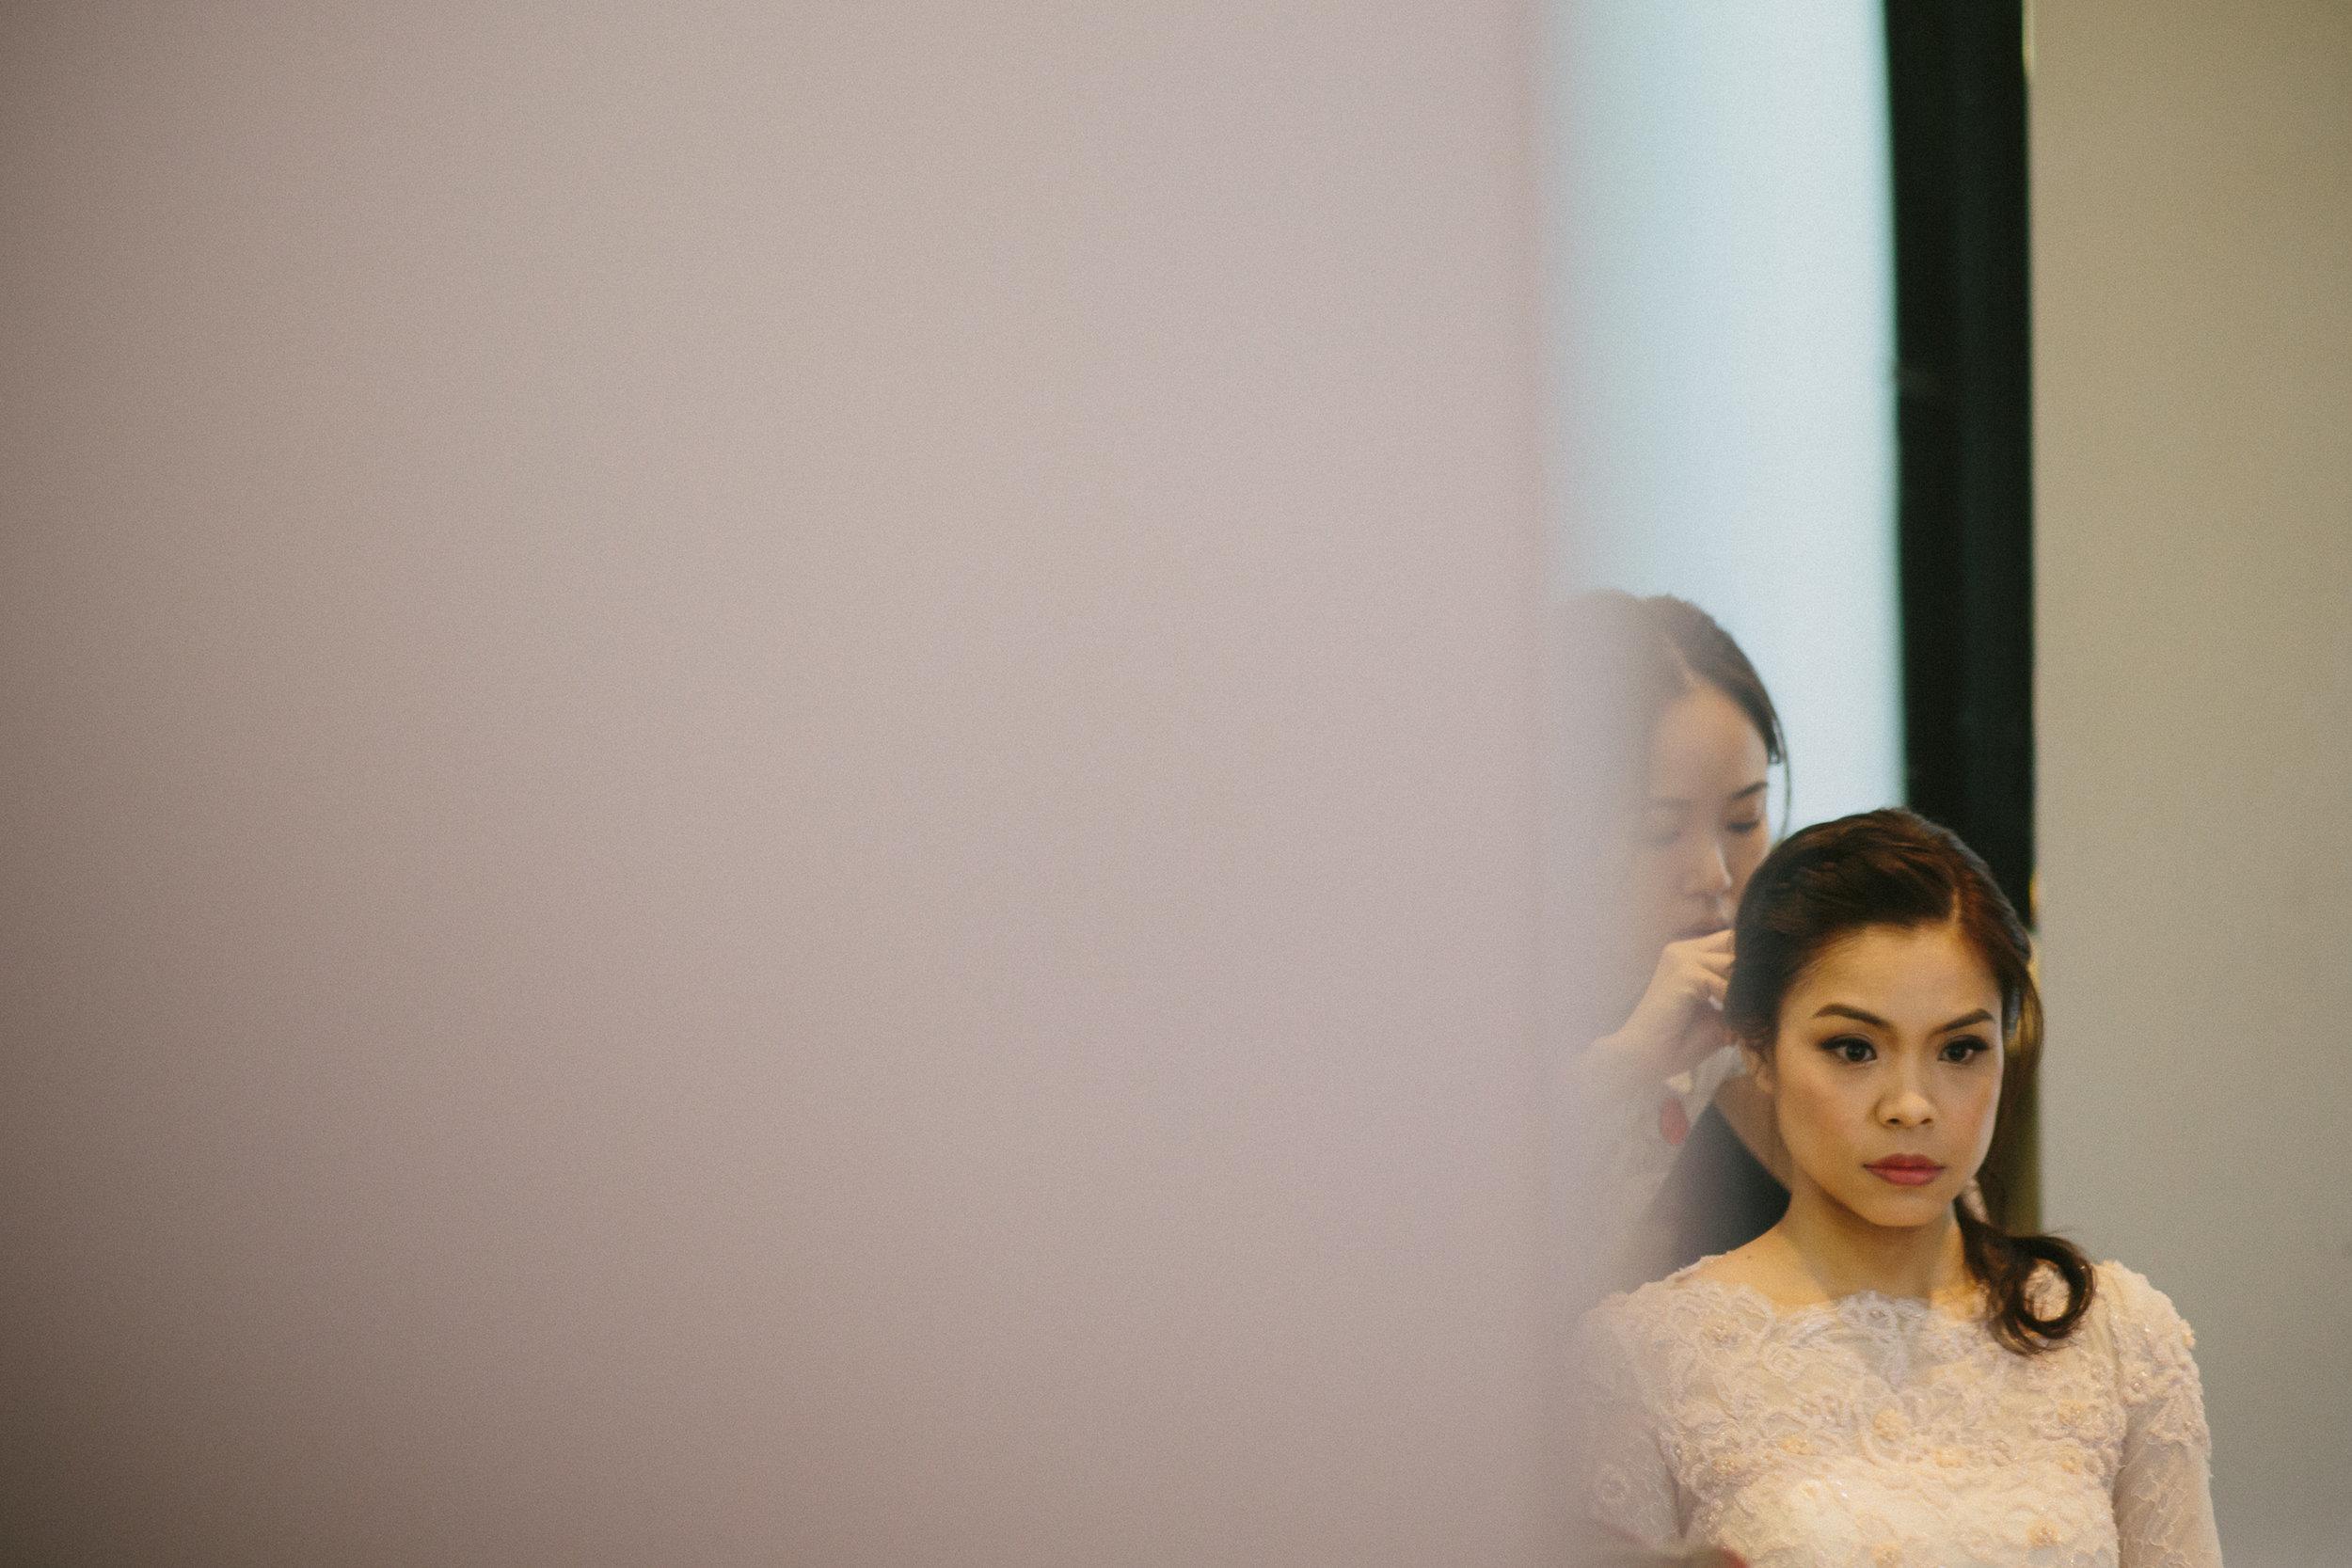 singapore-wedding-photographer-fadilah-kwan-004.jpg